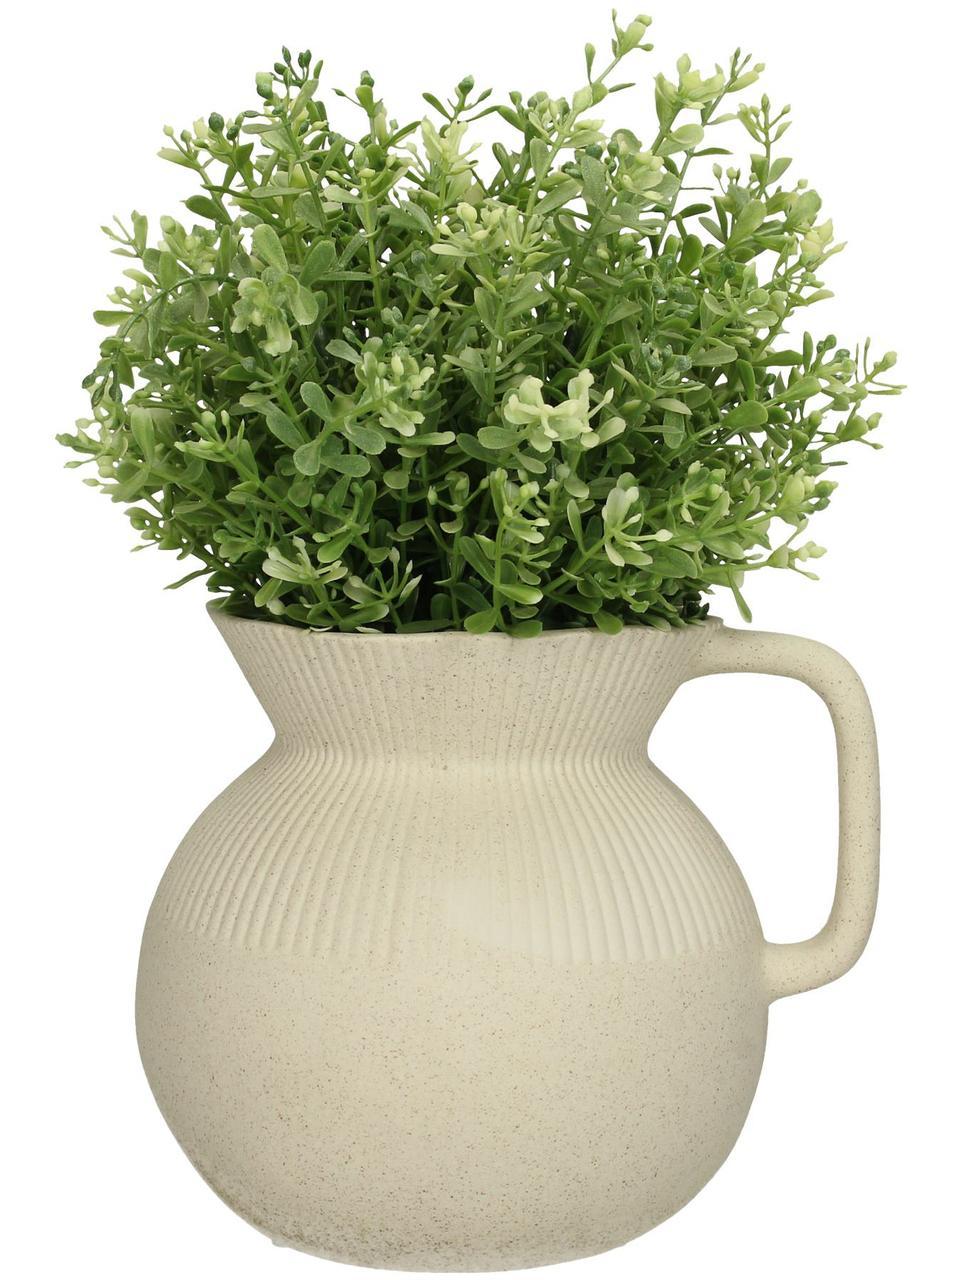 Vase Chysocolla aus Porzellan, Porzellan, Beige, 17 x 15 cm